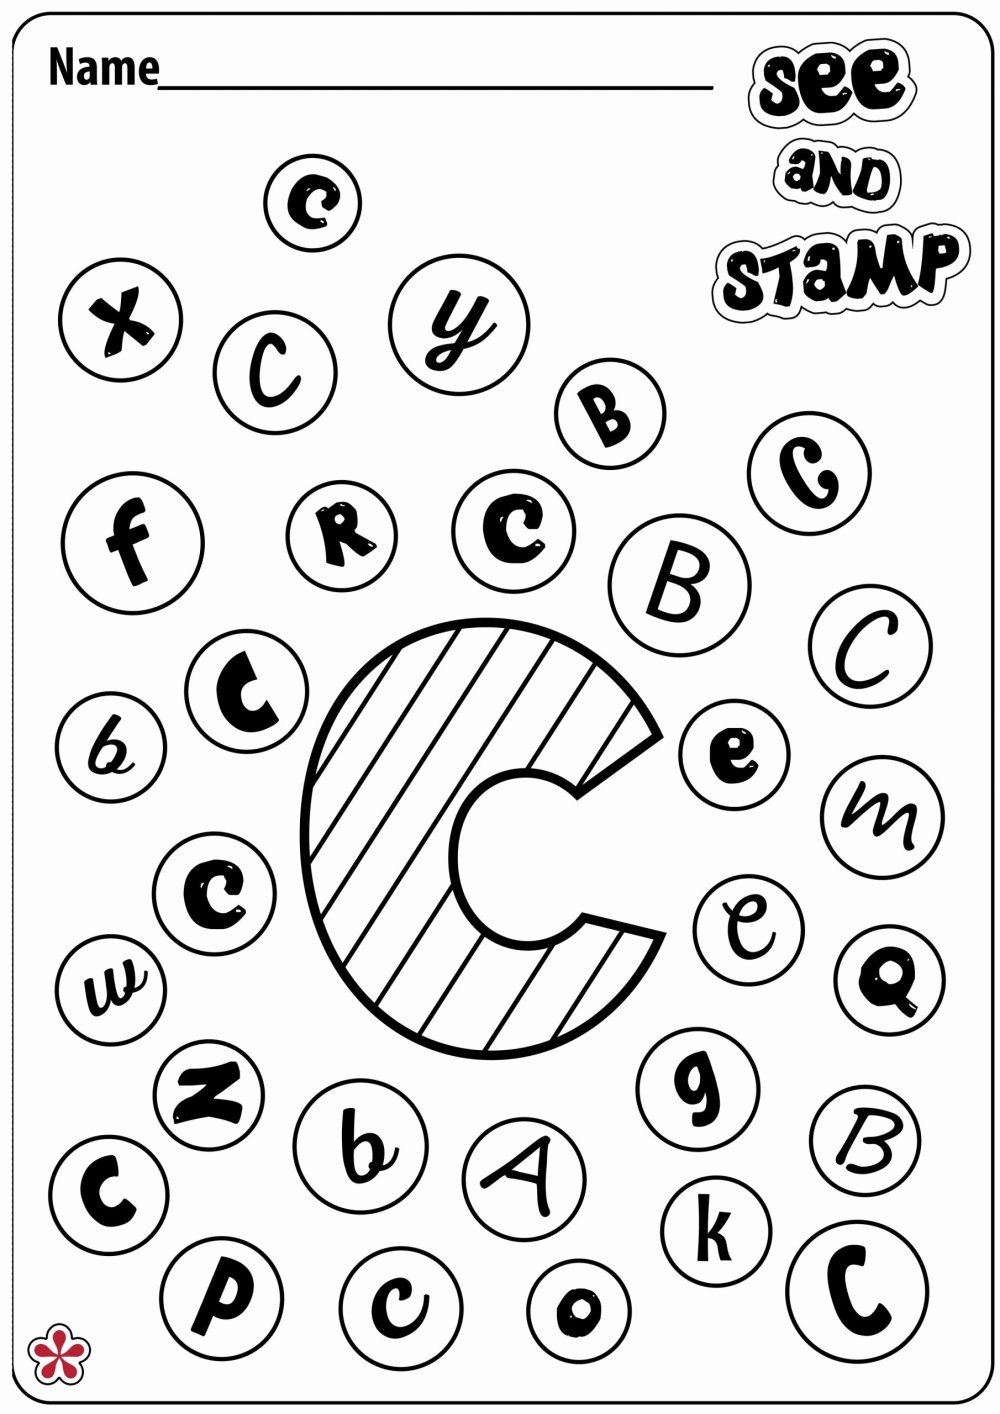 medium resolution of Montessori Worksheets for Preschoolers top Worksheets Math Worksheet  Kindergarten Worksheets – Printable Worksheets for Kids